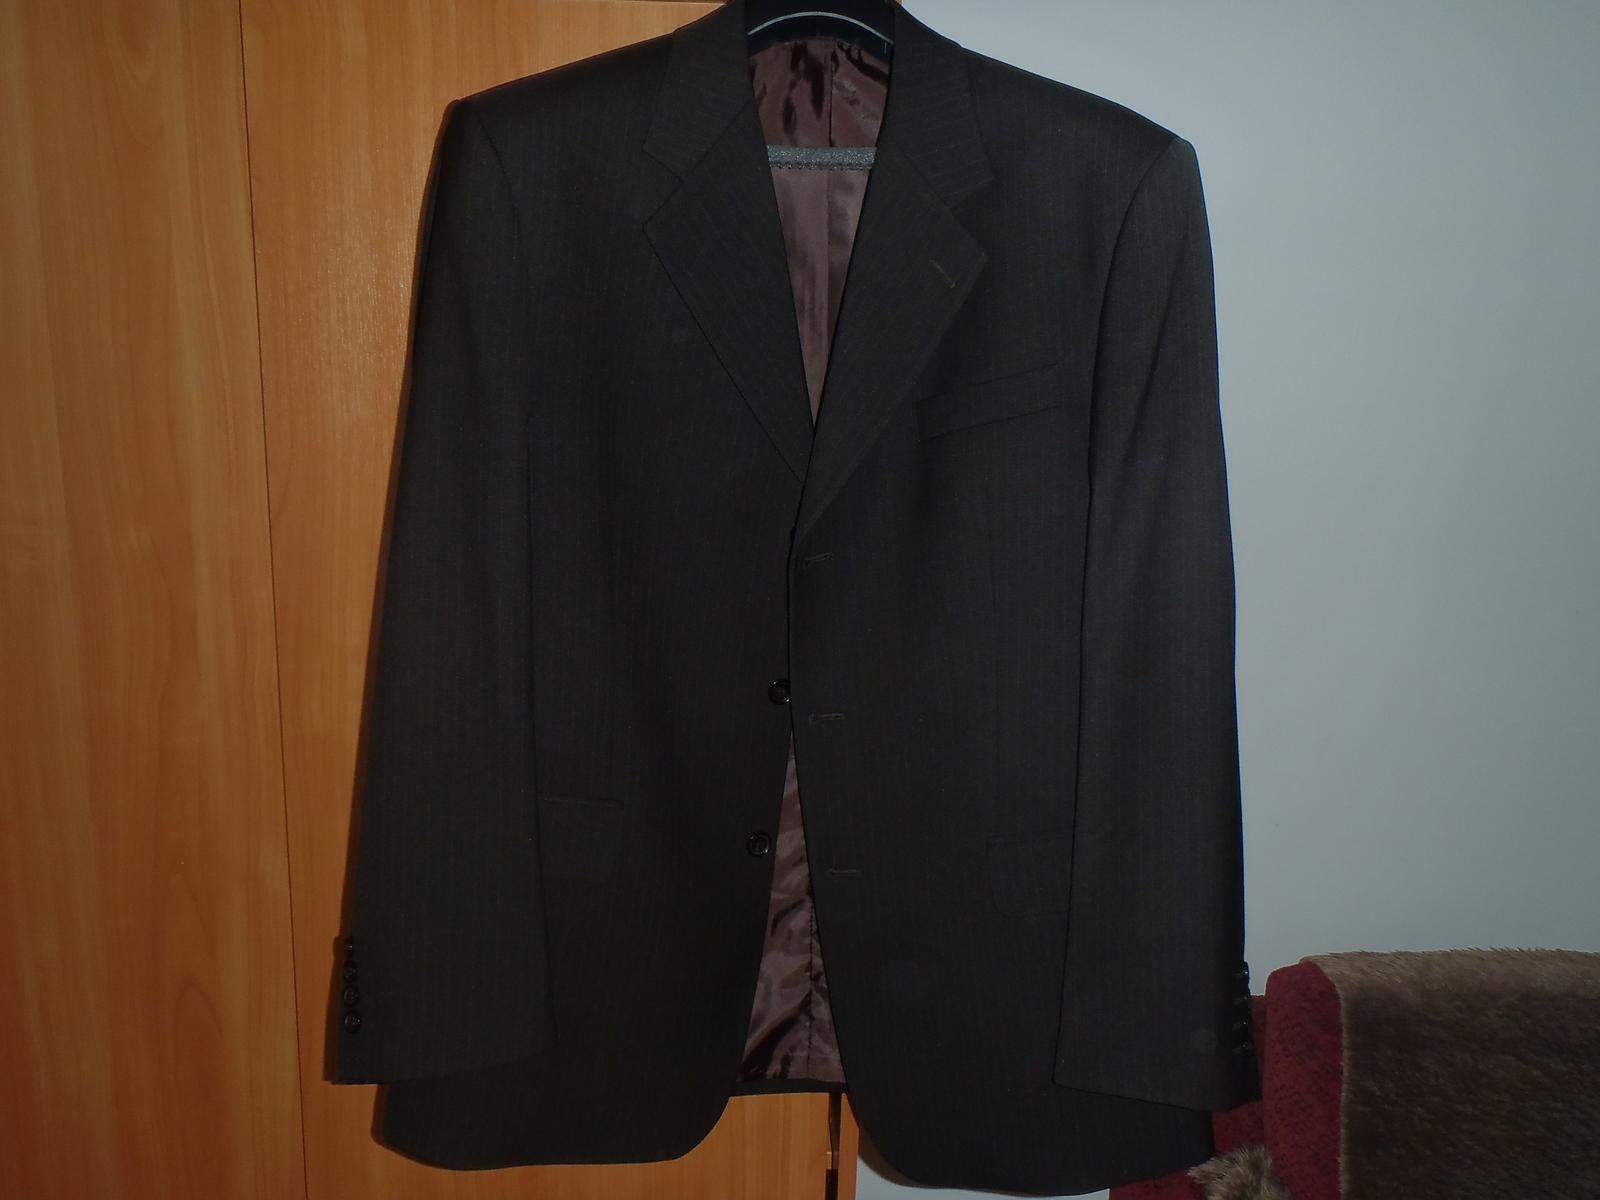 Hnedý oblek - Obrázok č. 2